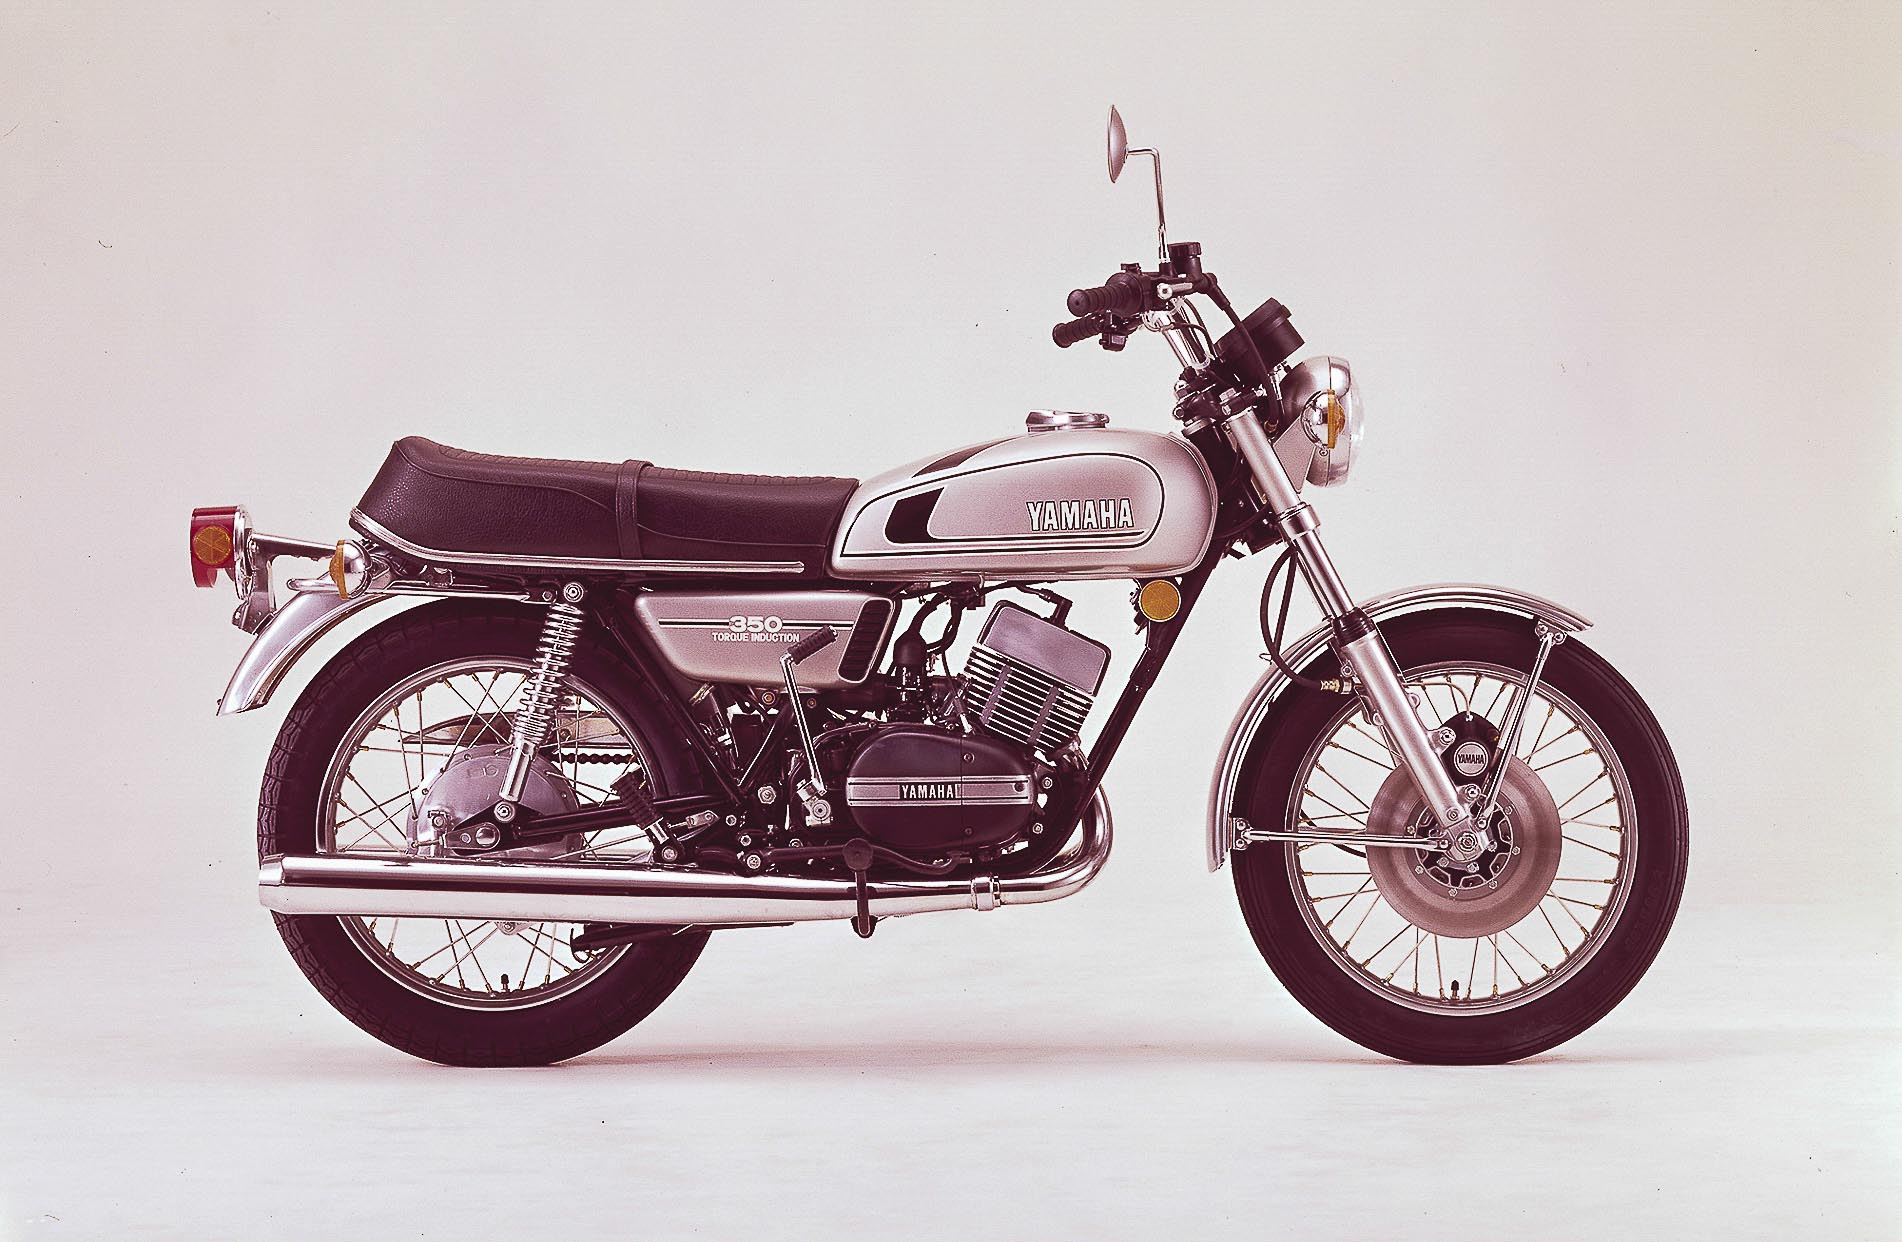 YAMAHA R5 - RD 350 (1970 - 1975)